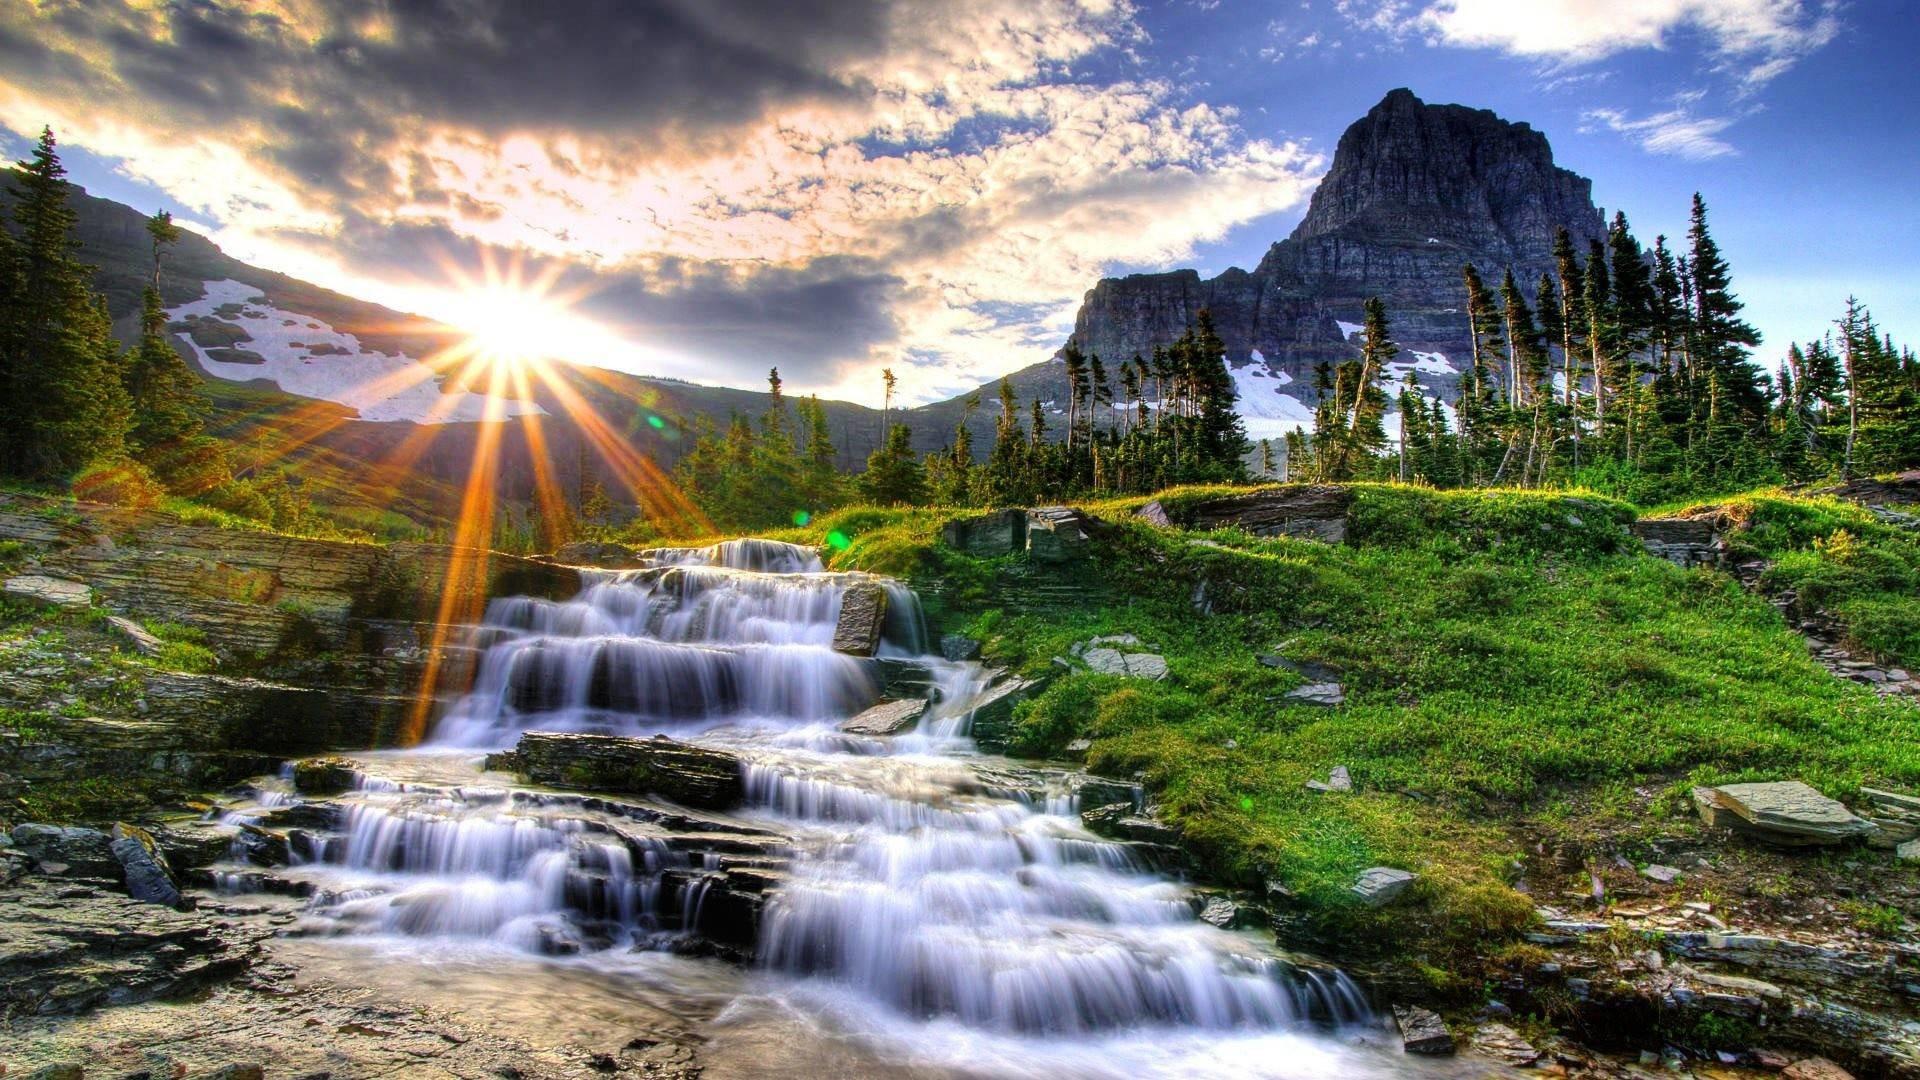 Explore Nature Desktop Wallpaper and more!